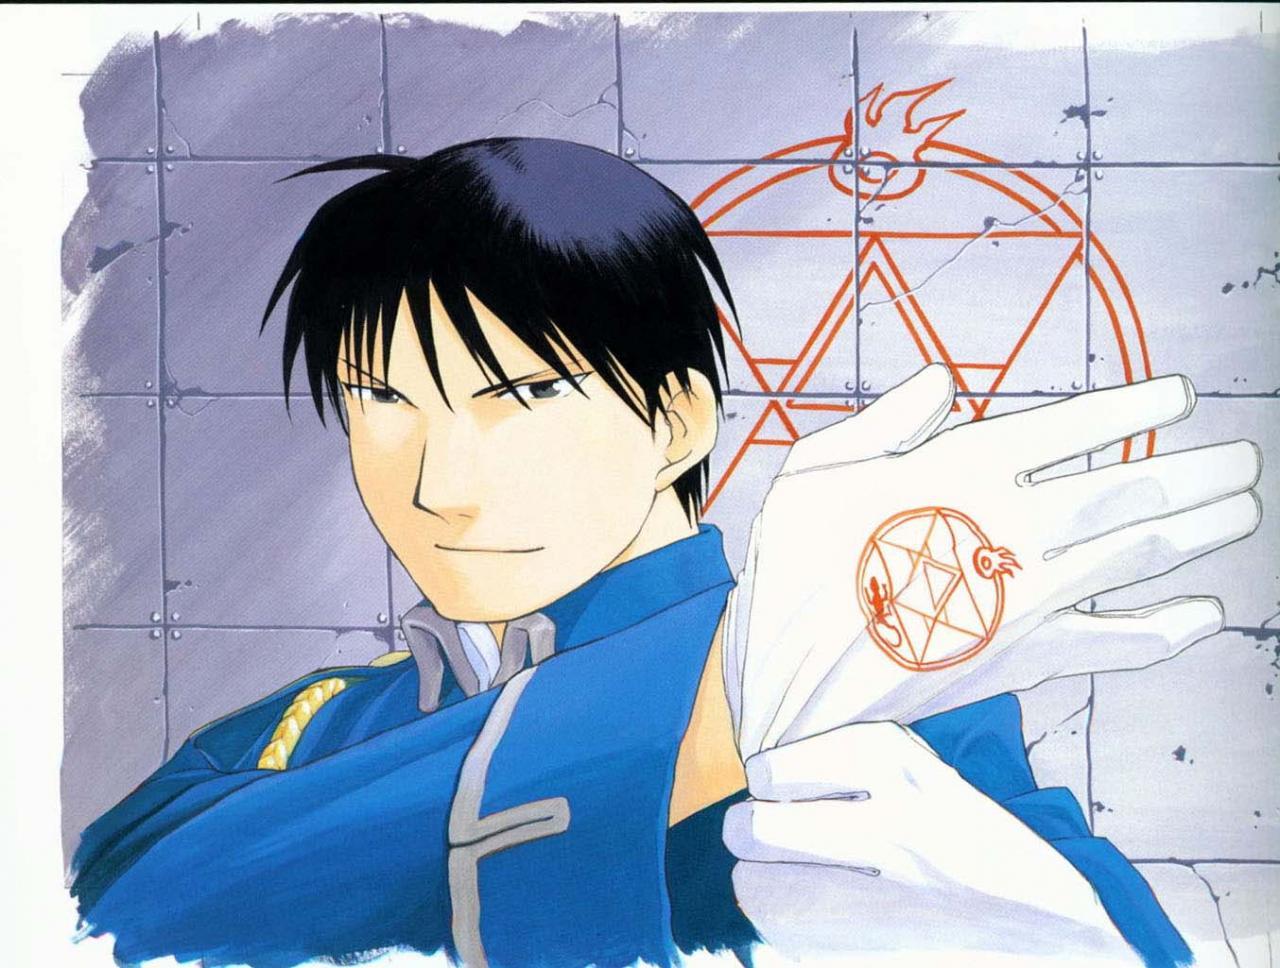 [manga] FullMetal Alchemist Fma-0035